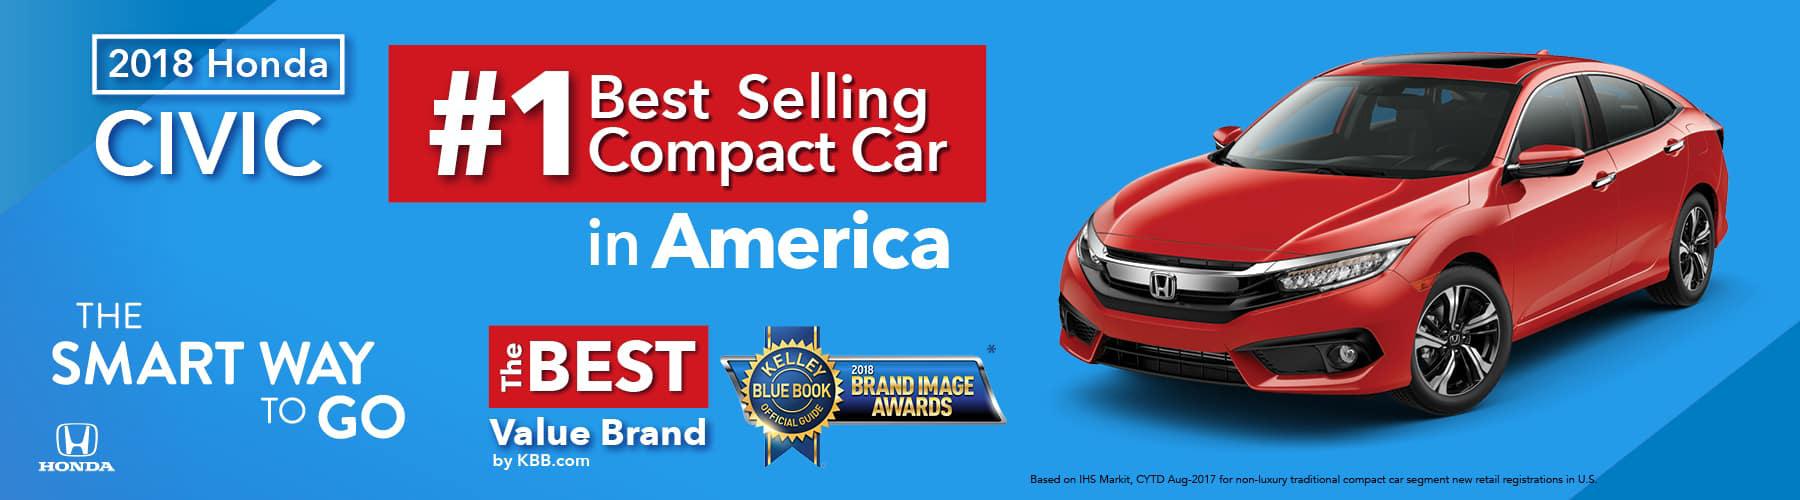 2018 Honda Civic Kelley Blue Book Best-Selling Compact Car in America ...